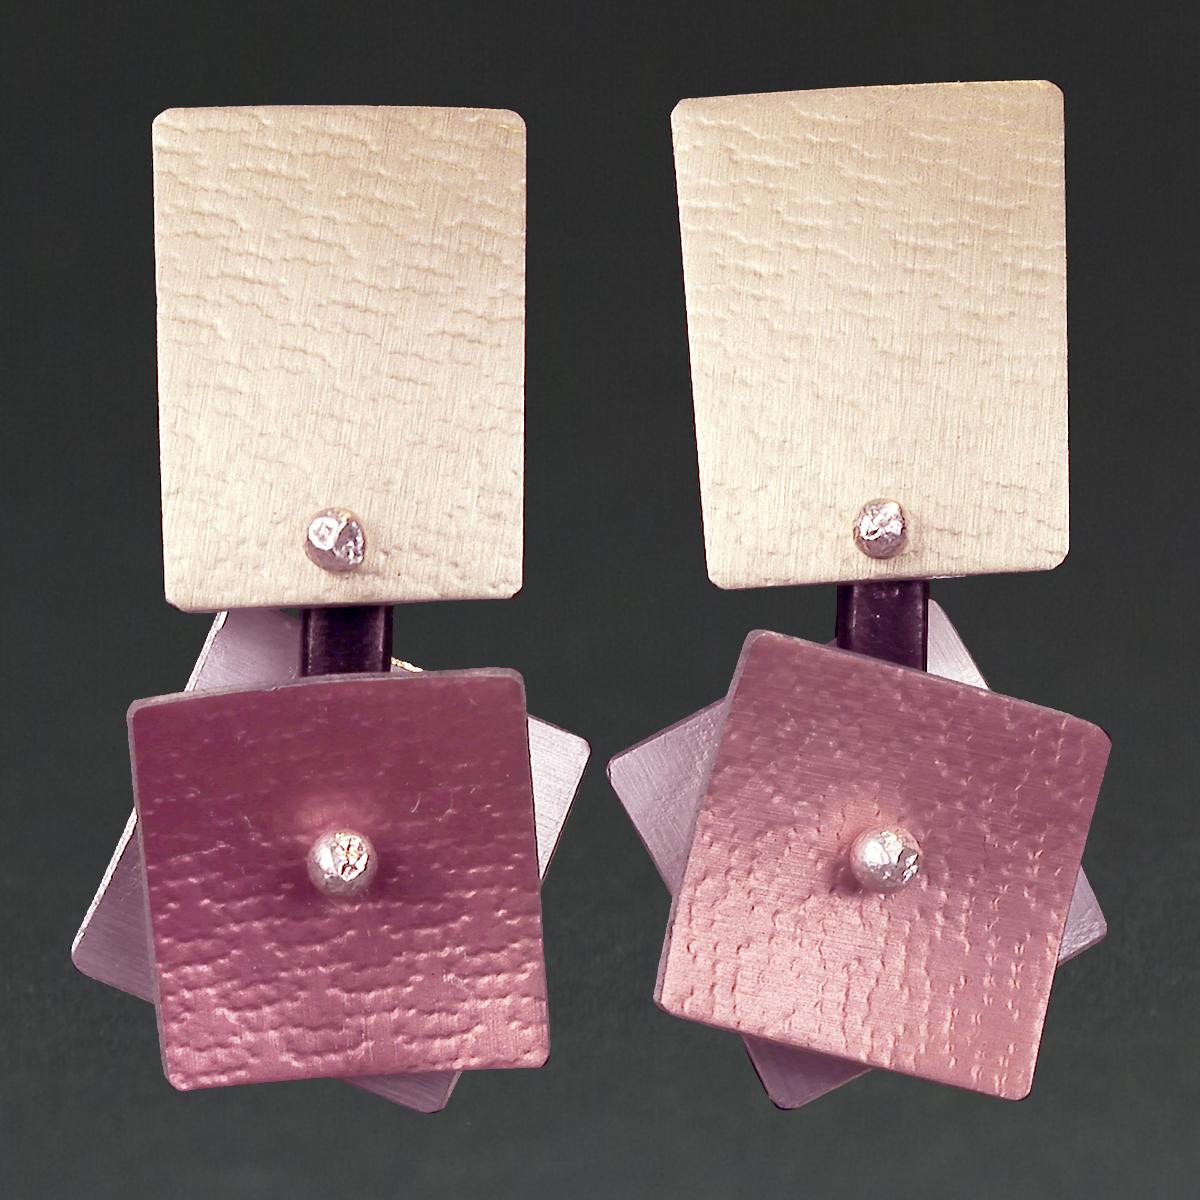 B - Chablis, Silver, Pink